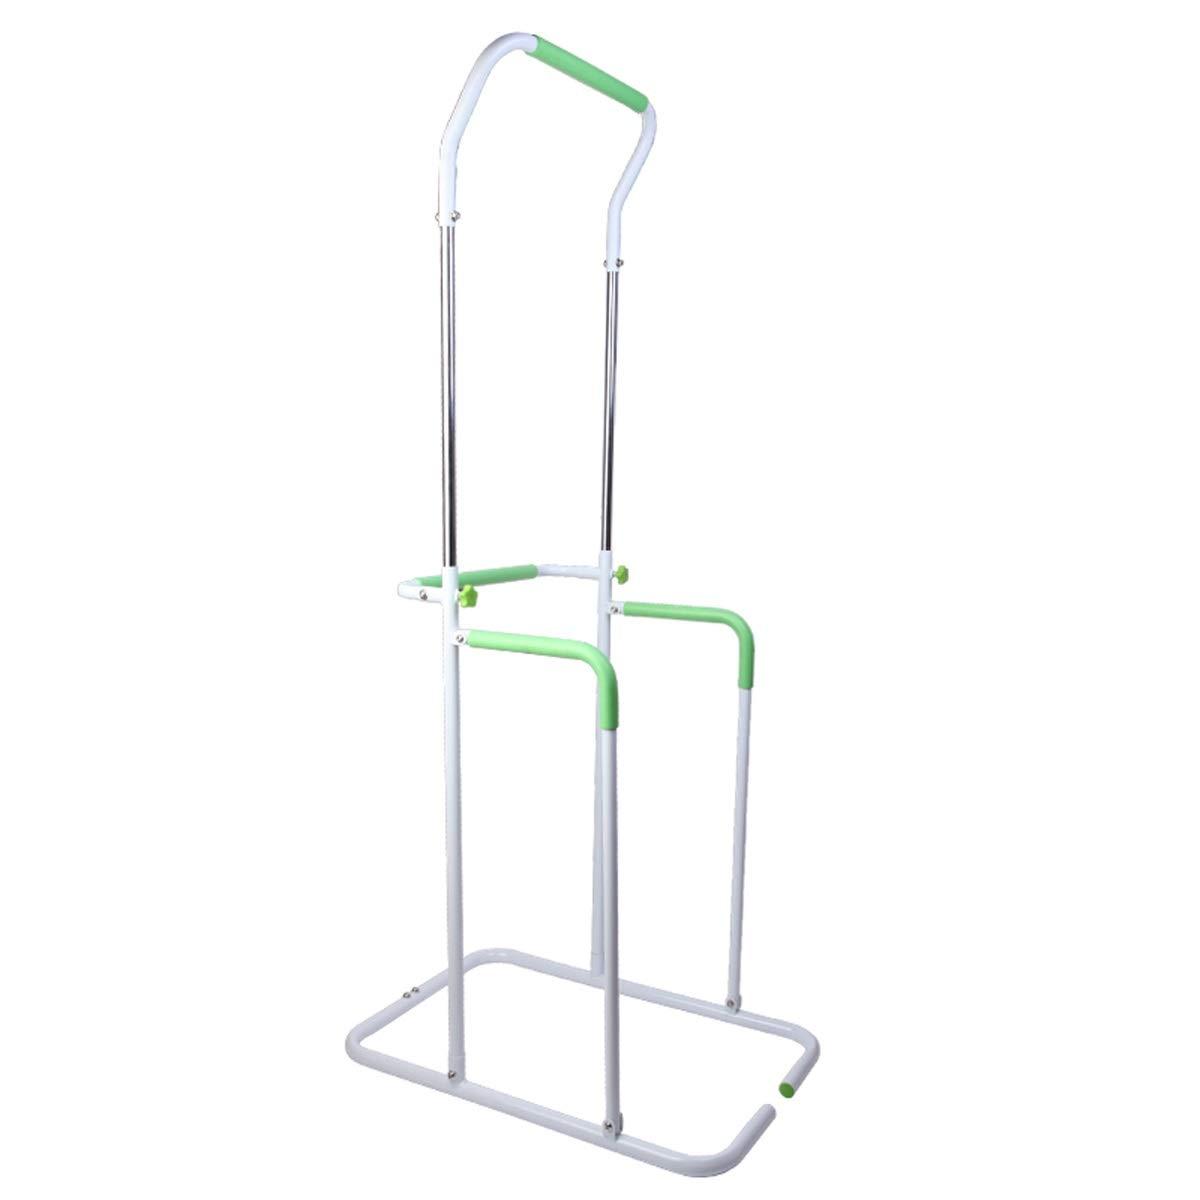 Baianju Household Single Parallel Bars Household Indoor Lacing Single Parallel Bars Pressing Legs Yoga Pull-ups Stretcher Fitness Equipment by Baianju